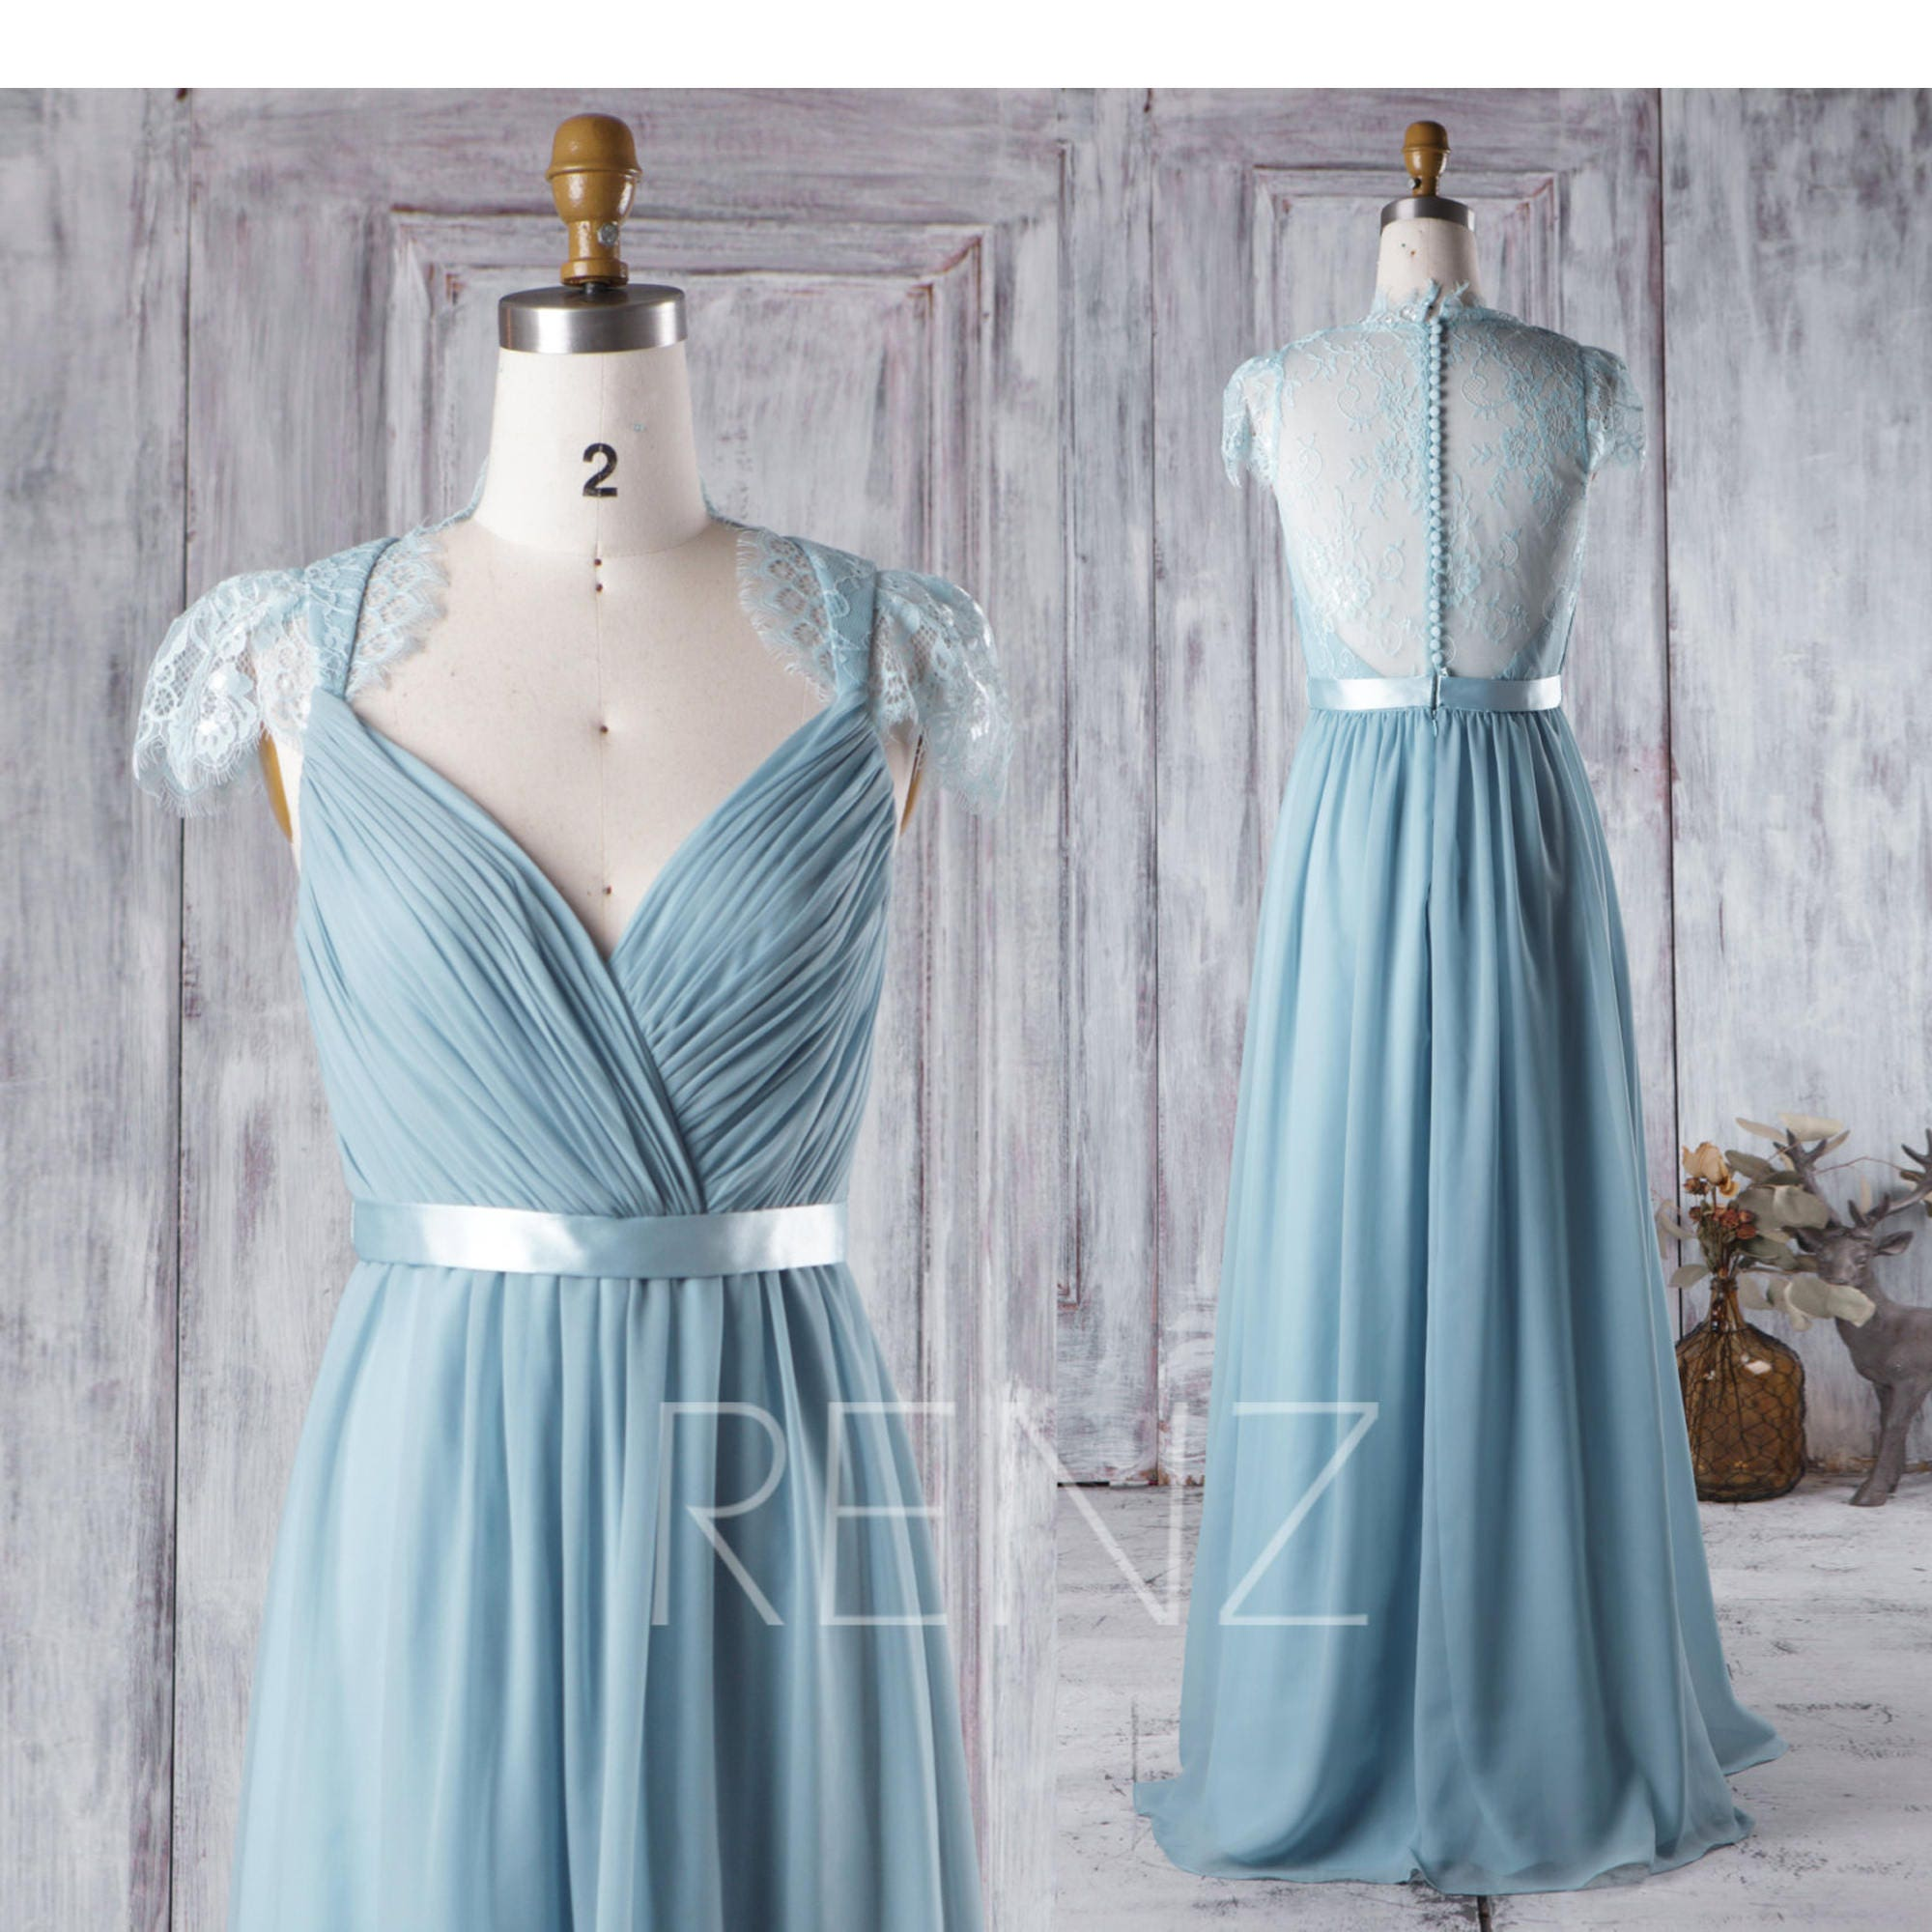 Dusty blue bridesmaid dress v neck wedding dress lace back zoom ombrellifo Gallery